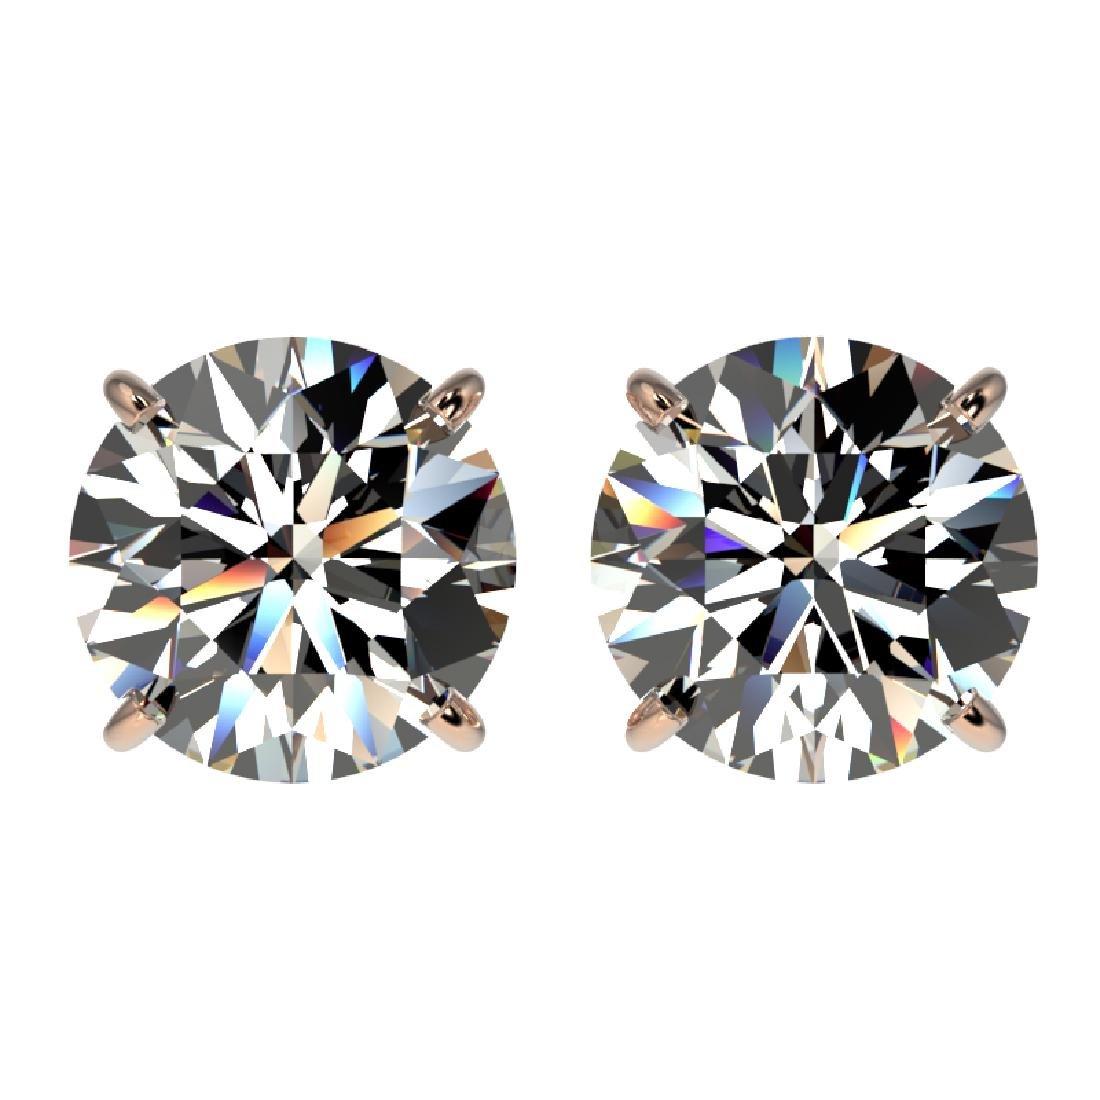 3.05 CTW Certified H-I Quality Diamond Stud Earrings